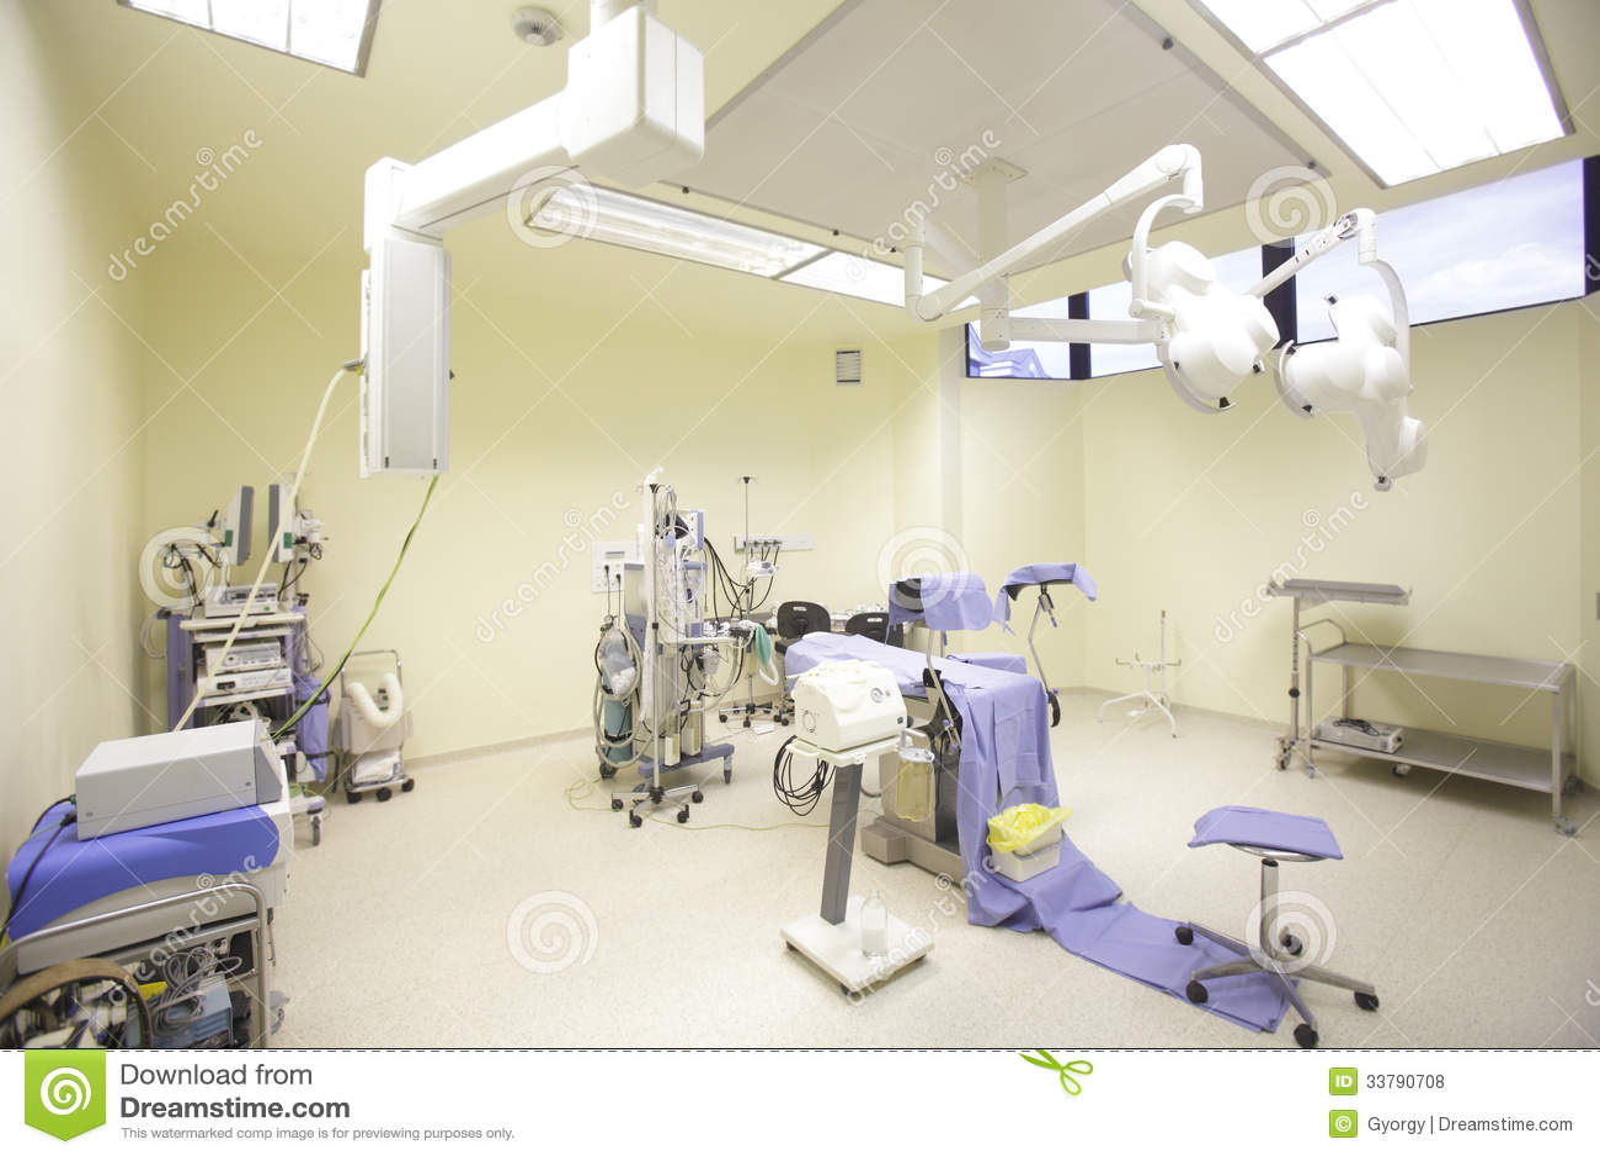 Hospital Operating Room Lighting